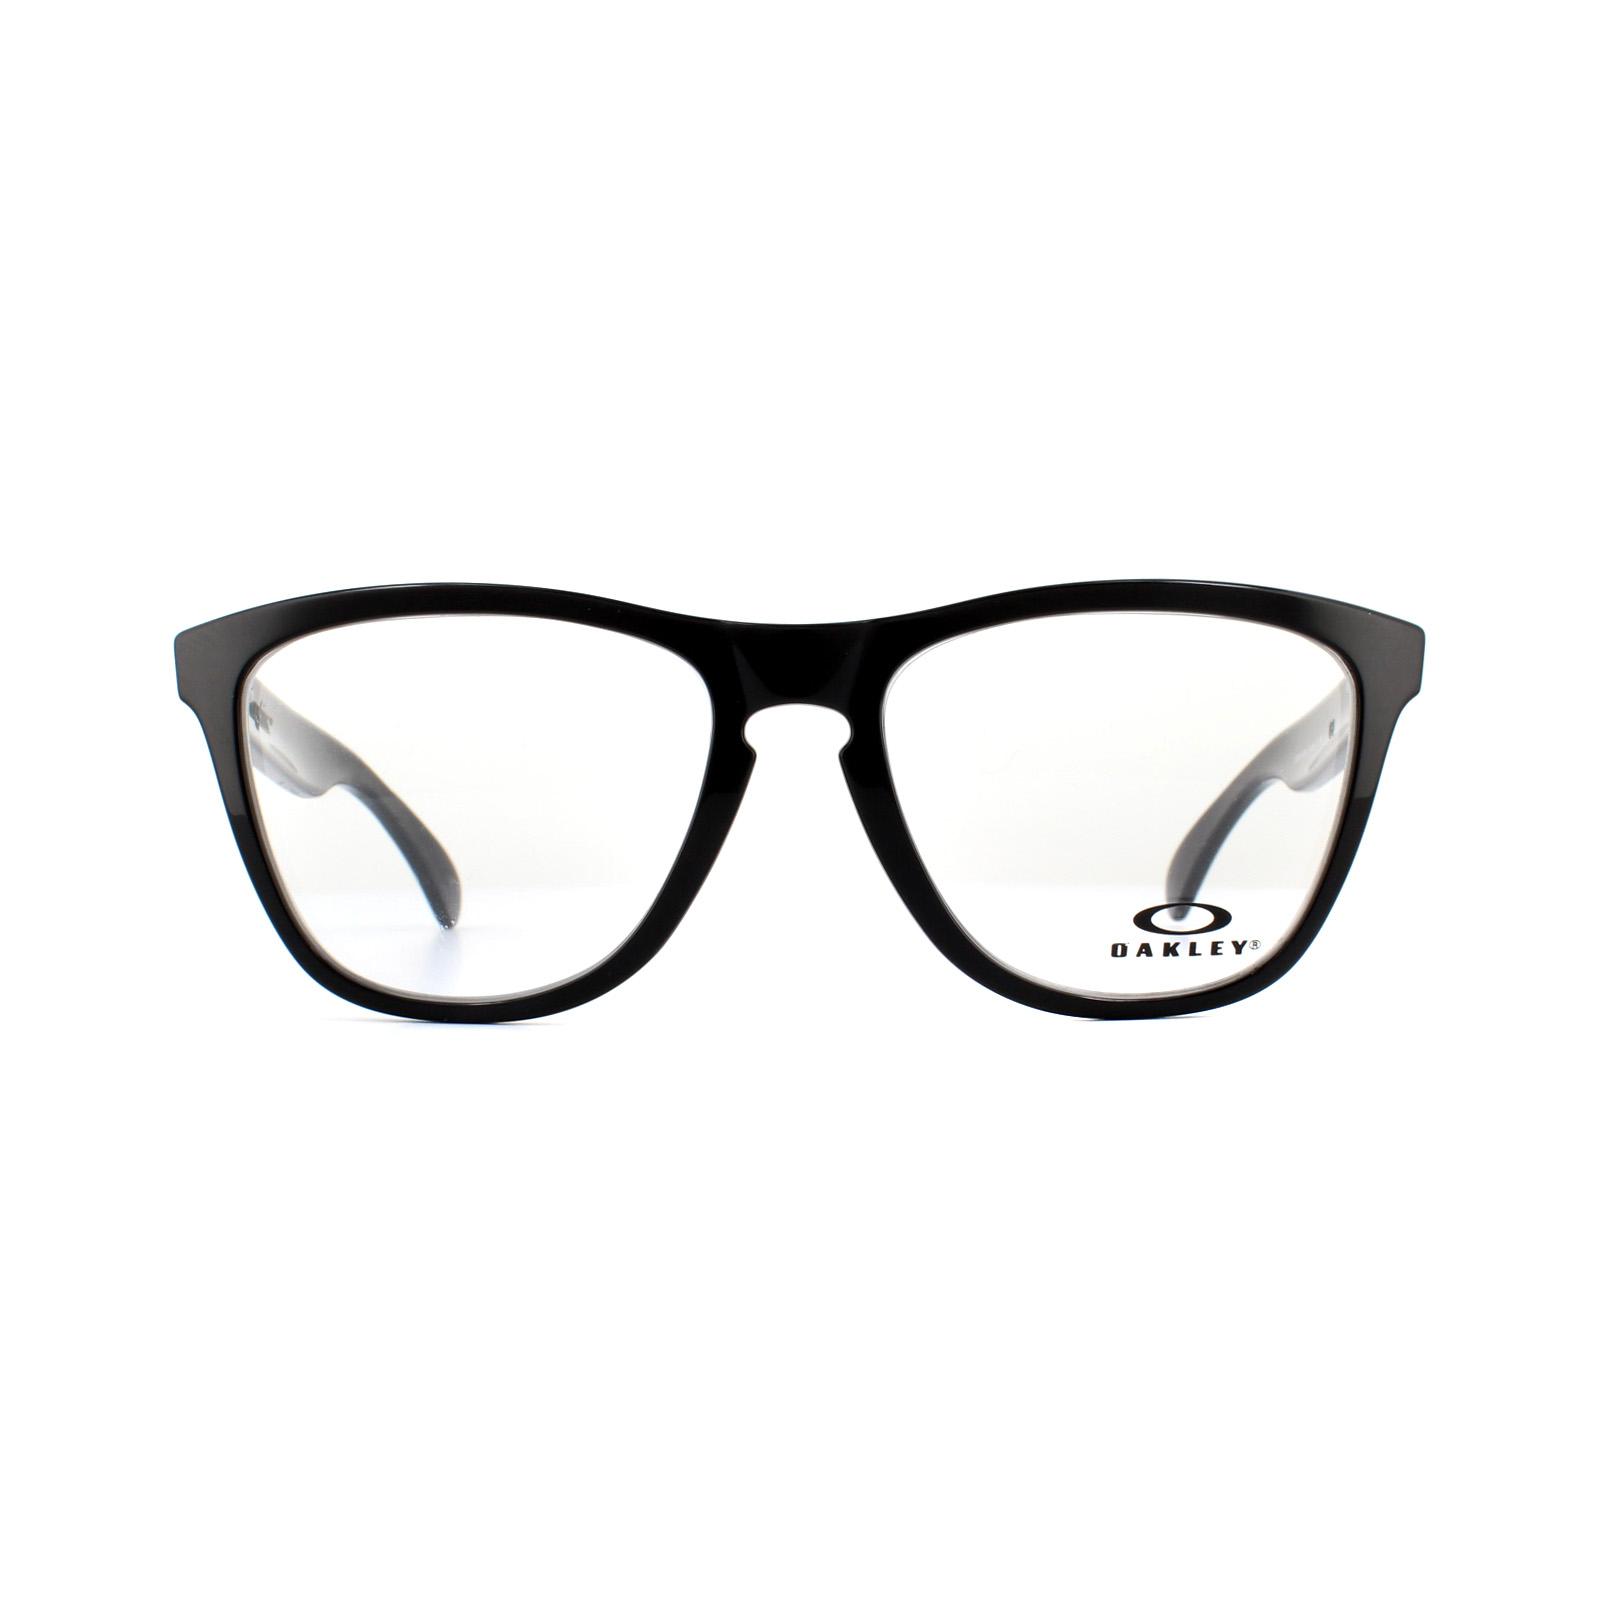 f8bb56888a Oakley Glasses Frames Frogskins OX8131-05 Black 54mm 888392320988